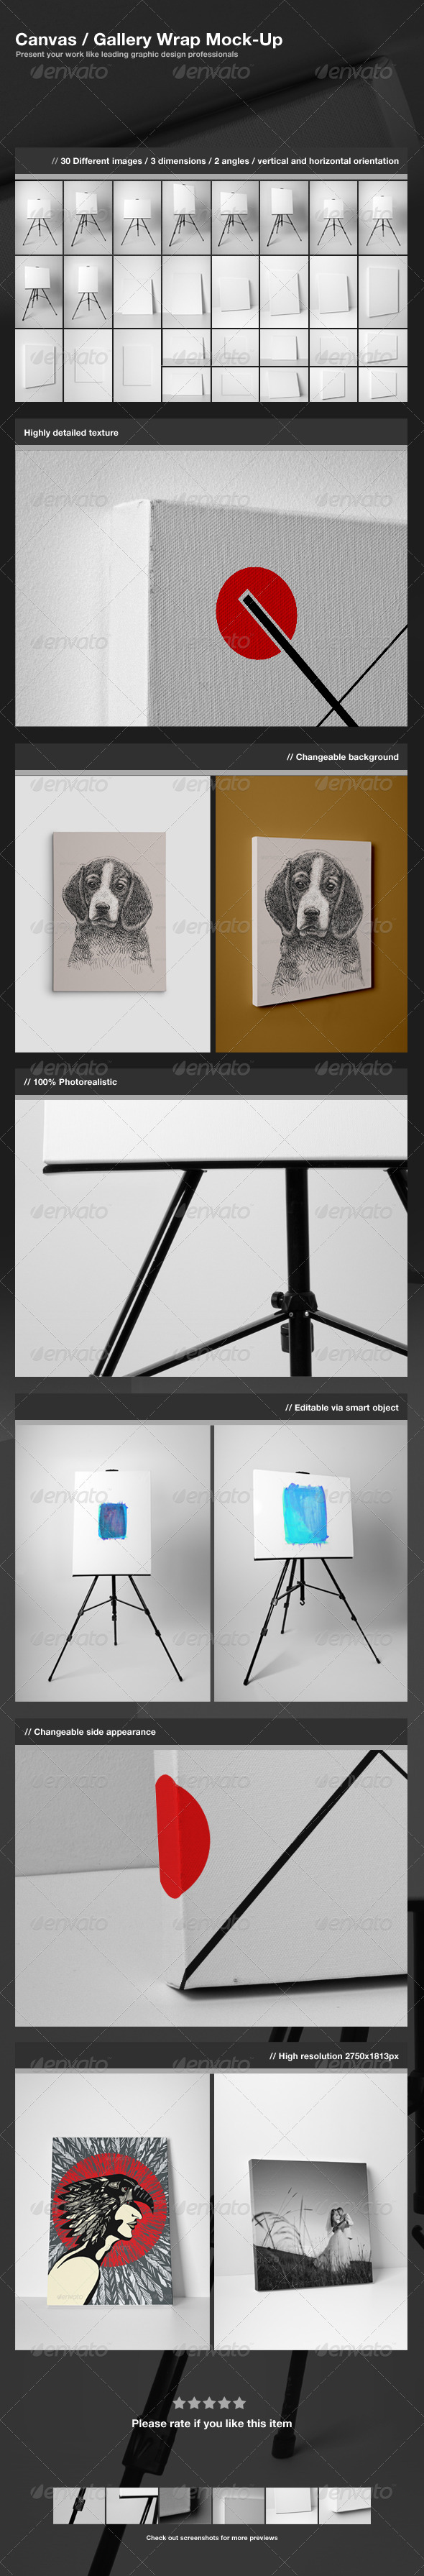 GraphicRiver Canvas Gallery Wrap Mock-Up 3264135